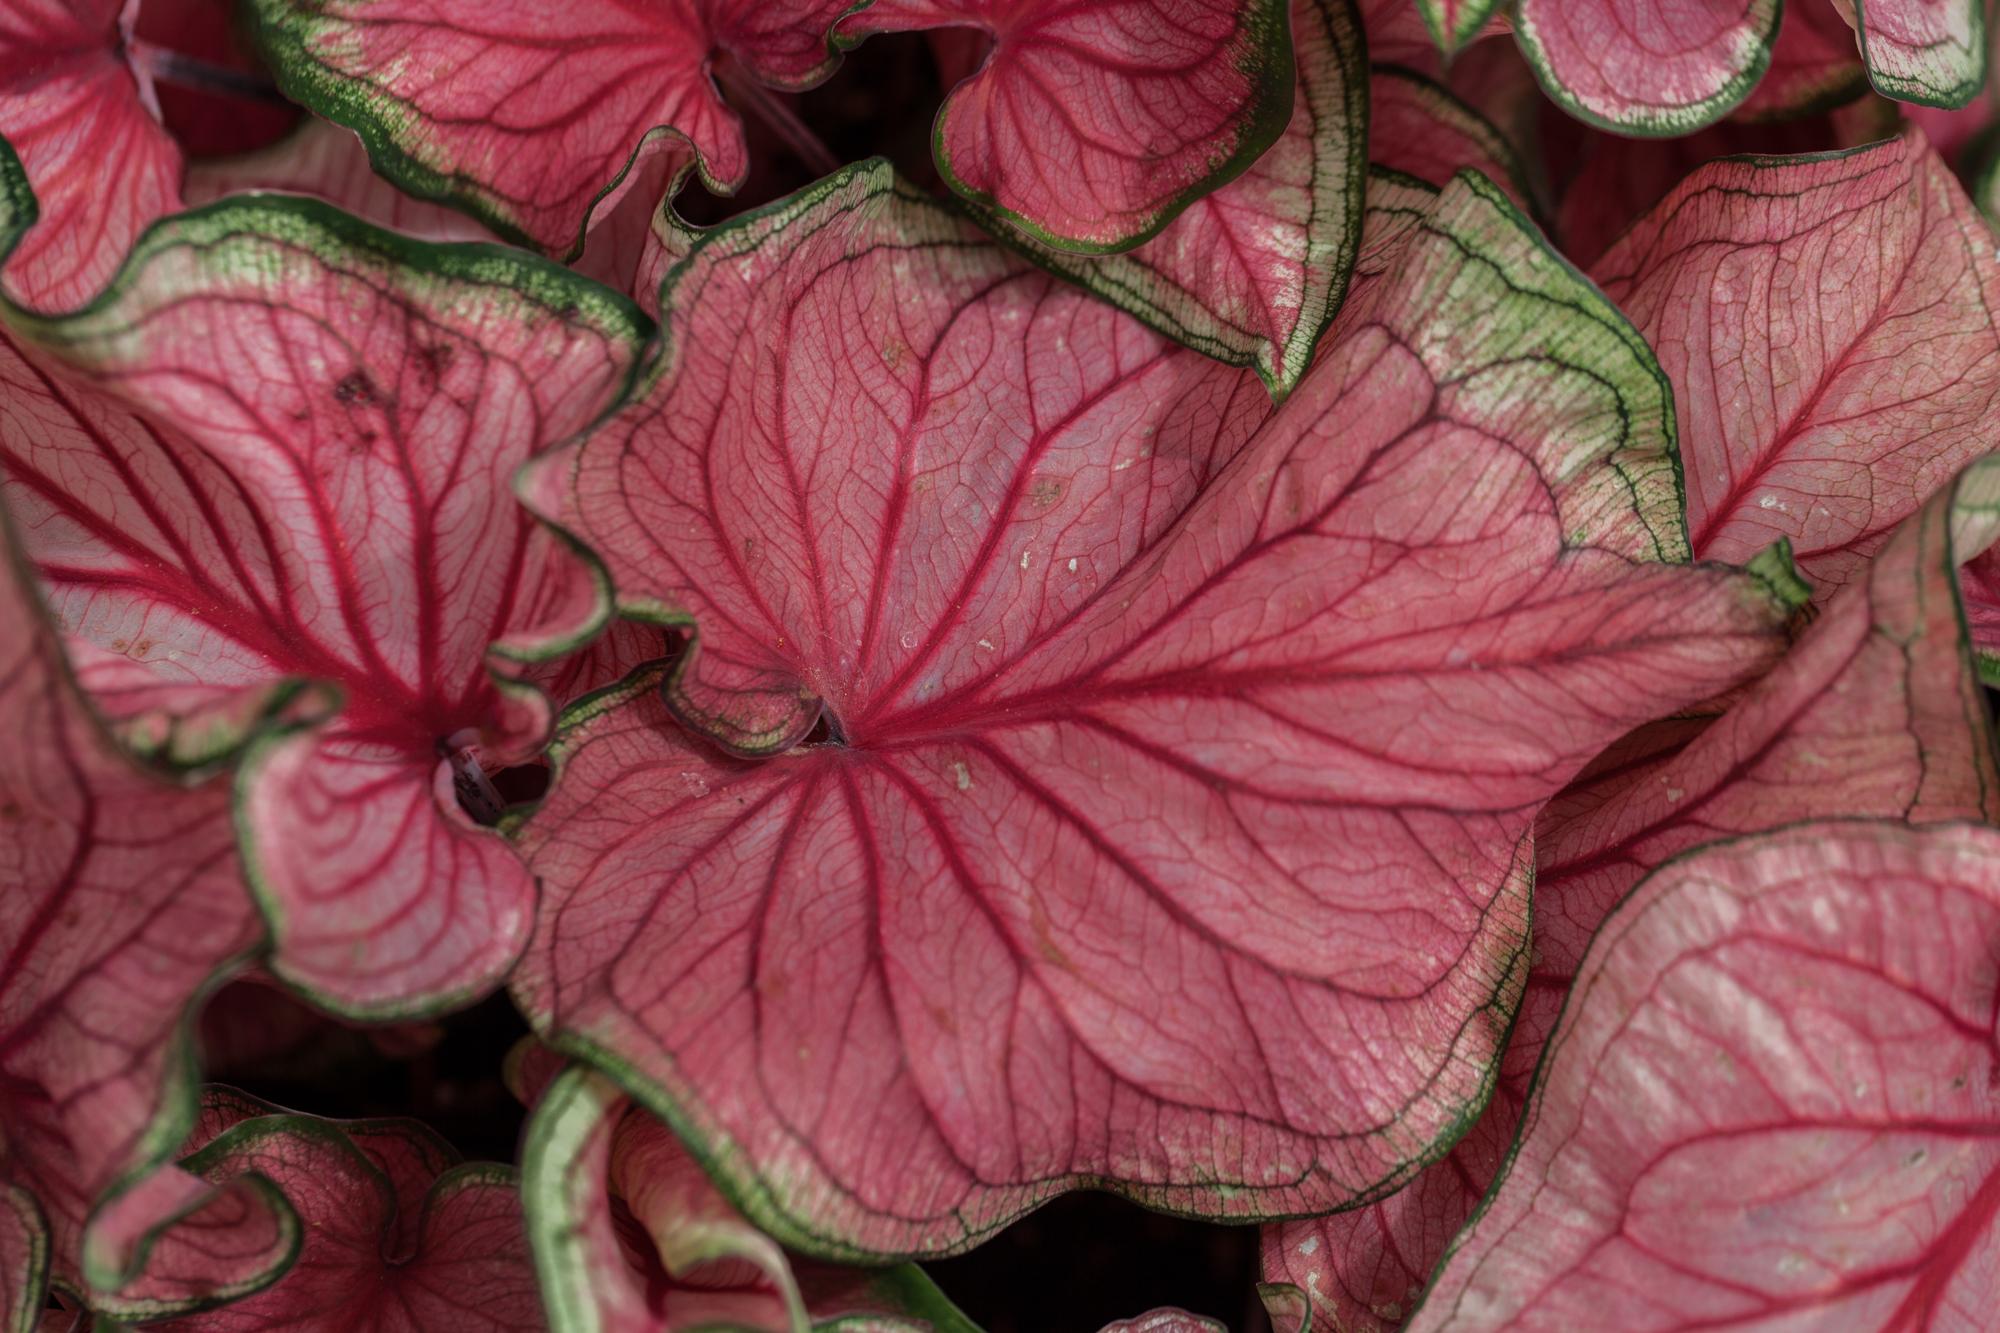 Planting-Fields-Arboretum-Greenhouse-Homestead-Brooklyn-red-Caladium.jpg